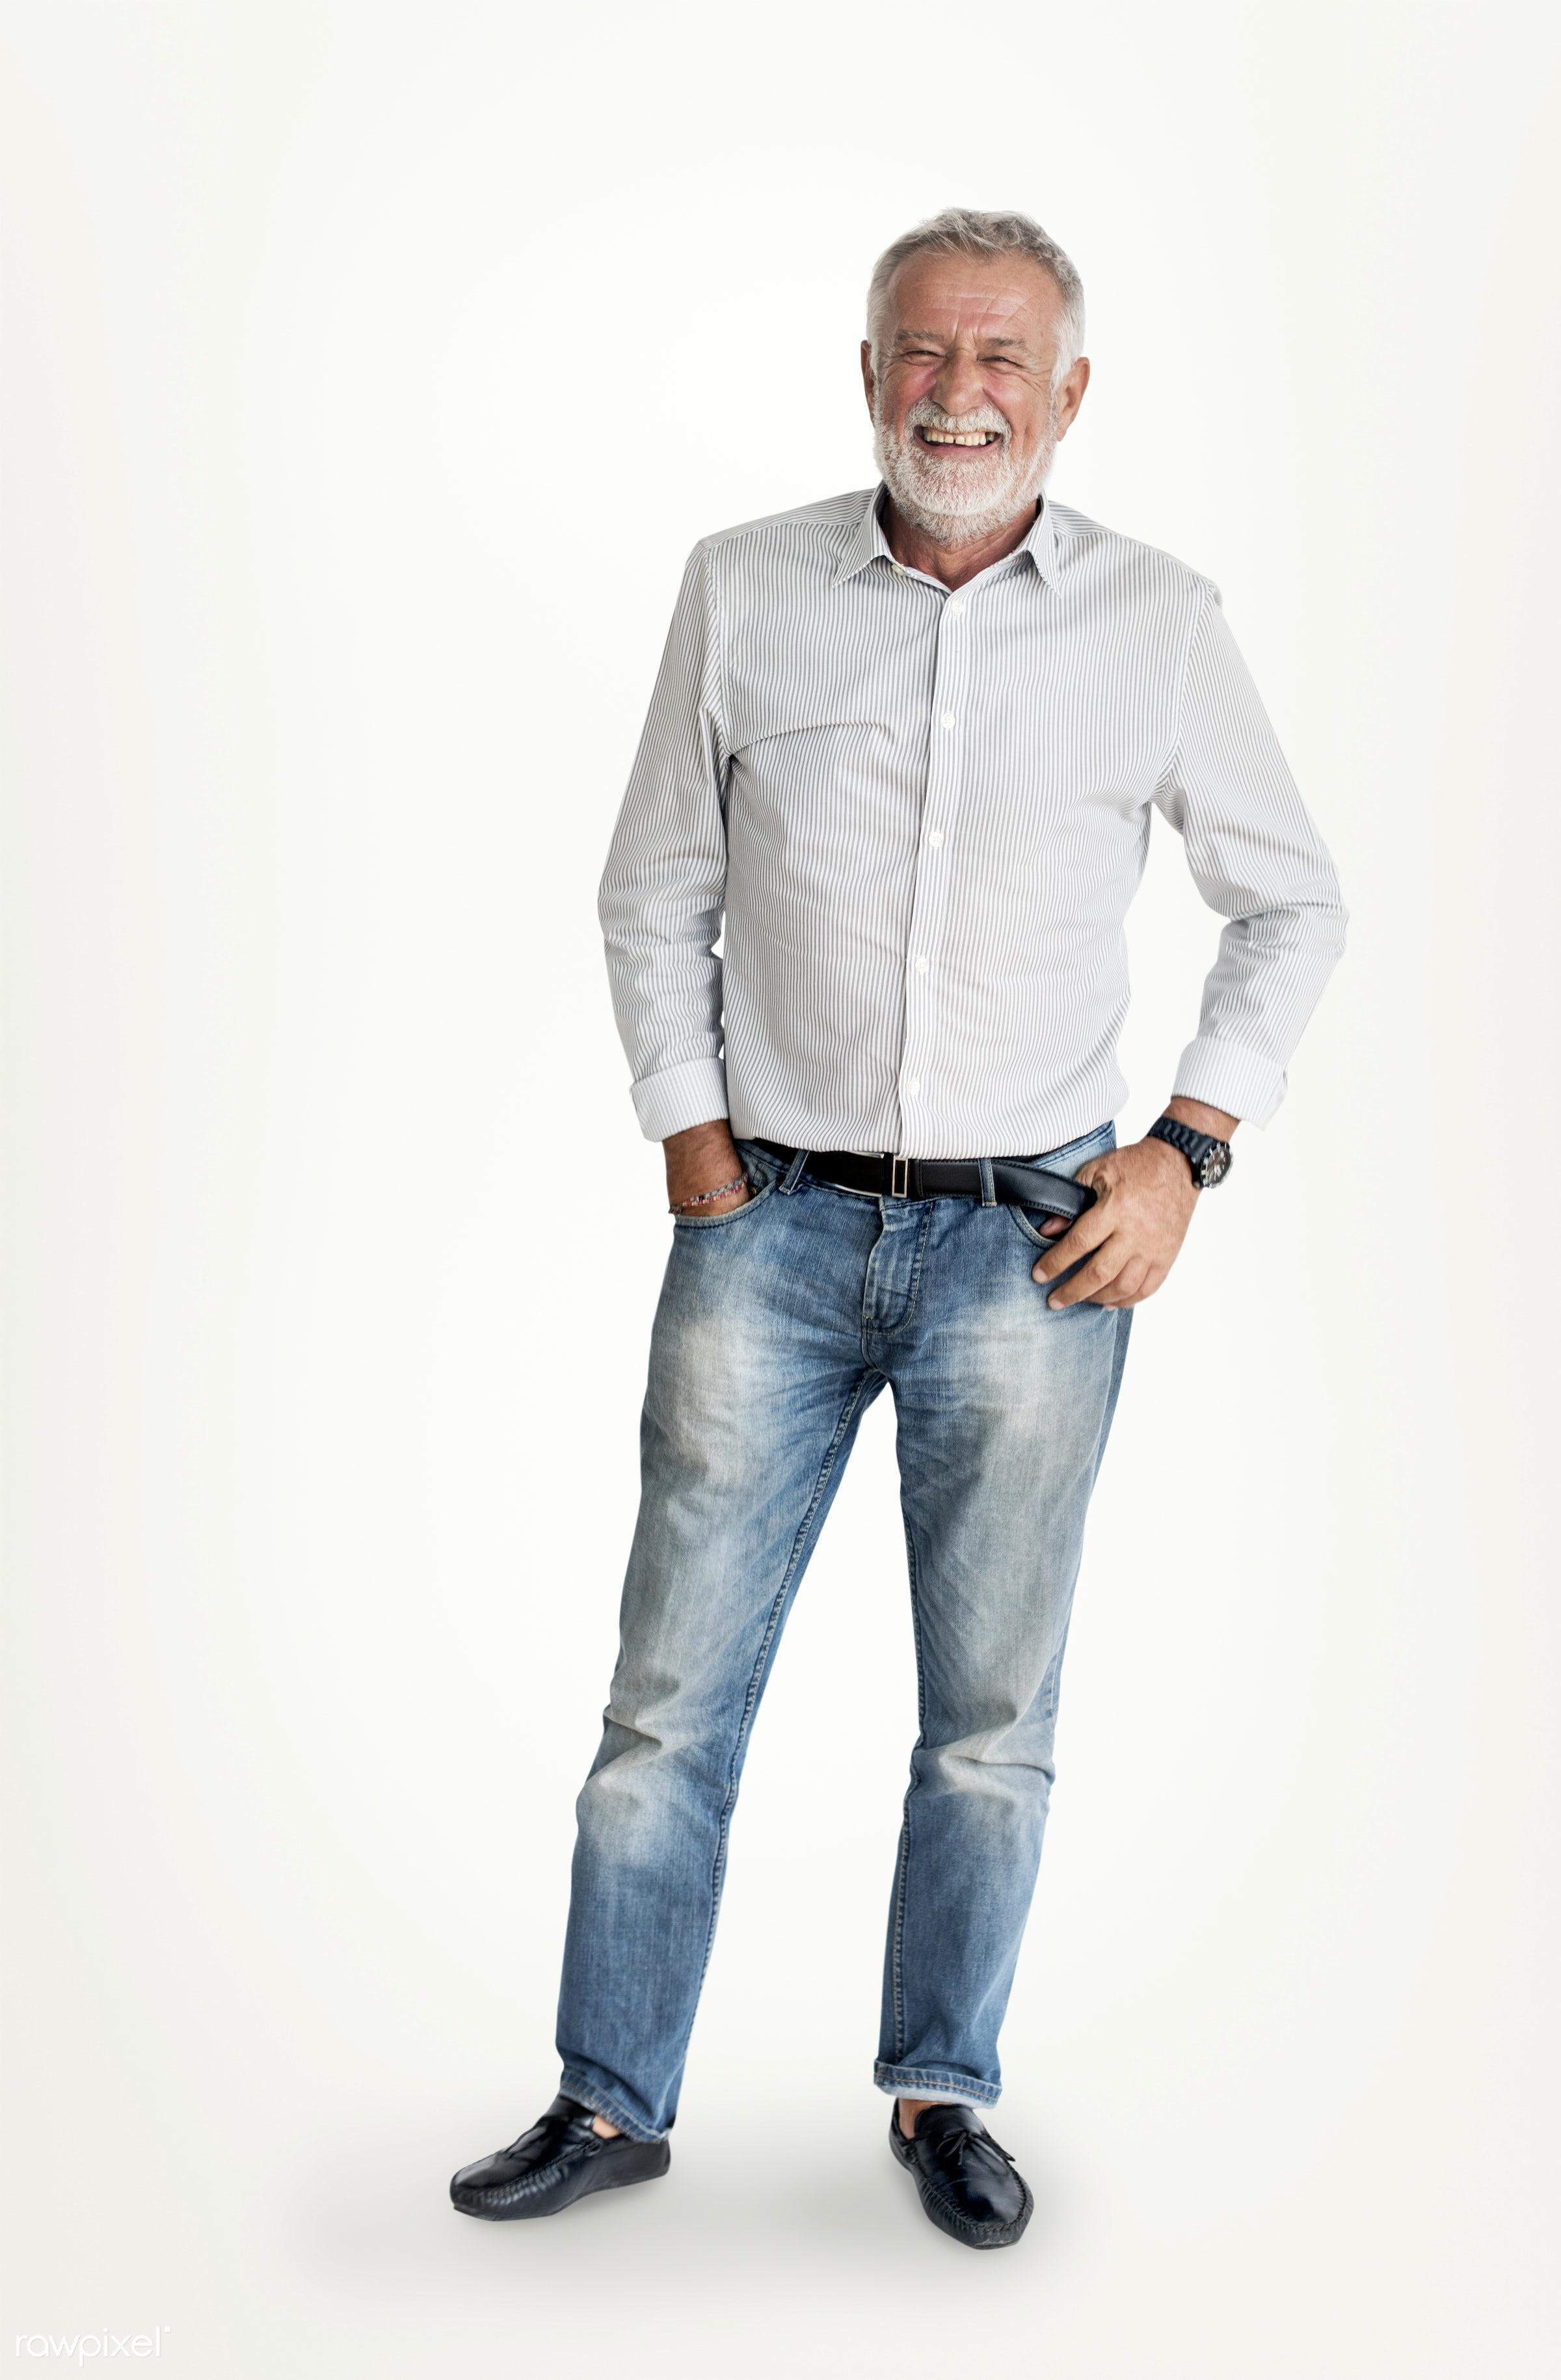 Portrait of bearded senior man - expression, face, joy, isolated on white, carefree, laughing, style, happy, lifestyle,...